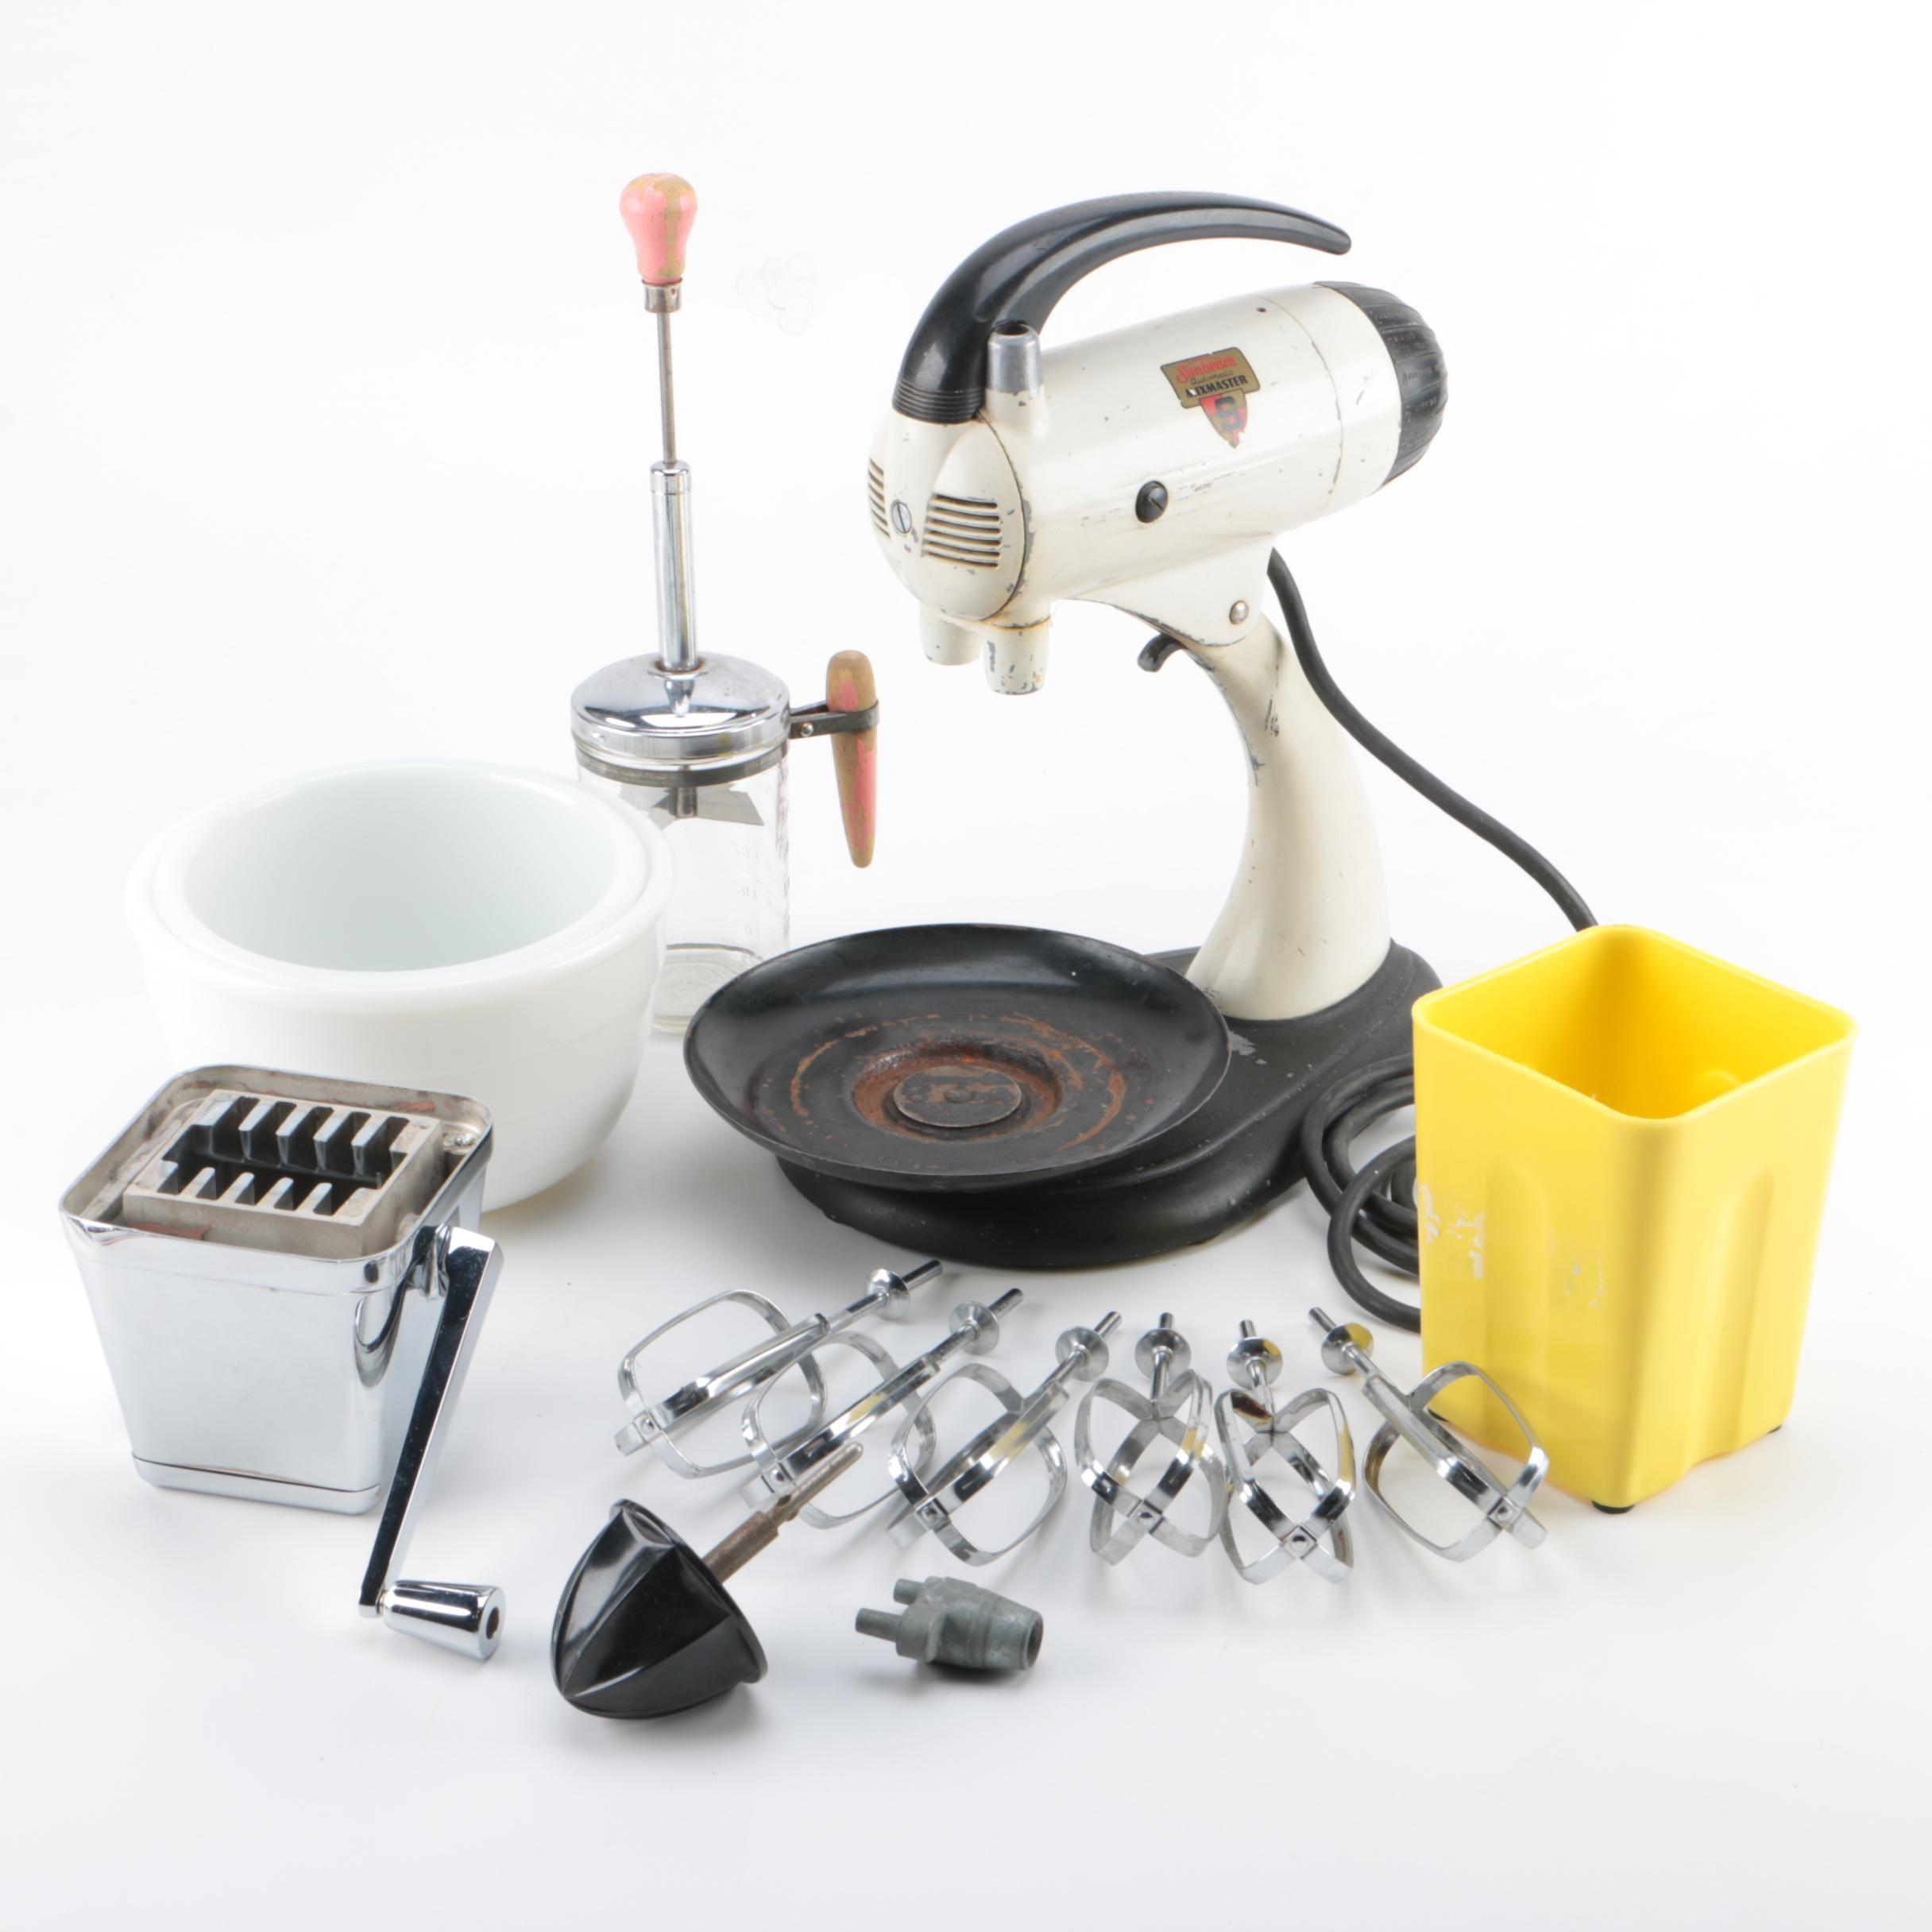 Sunbeam Mixmaster Stand Mixer, Manual Food Chopper and More